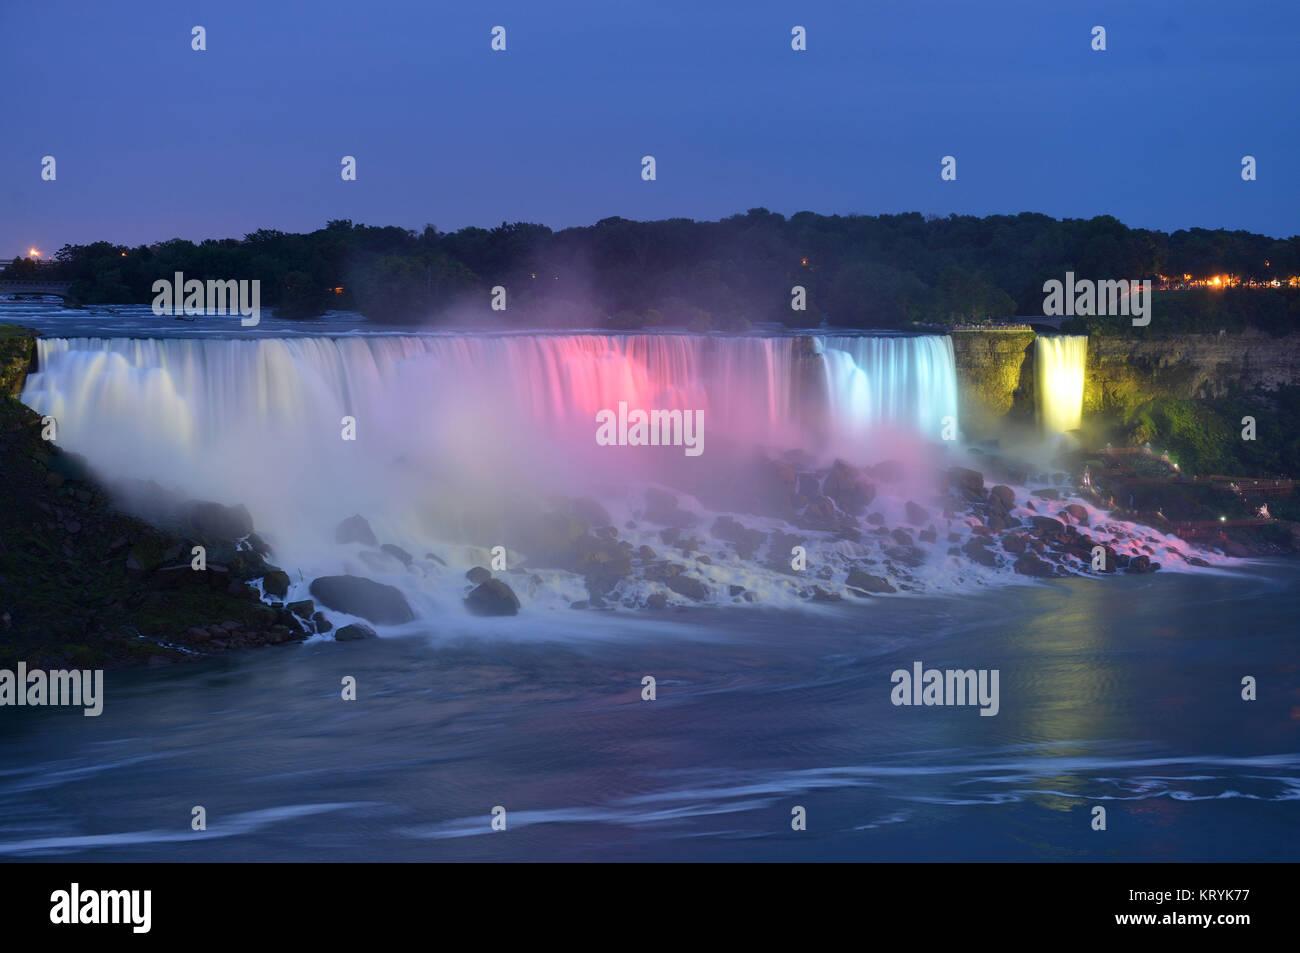 American of case, Niagarafaelle, New York, the USA / Niagaraf?lle, ´American Falls´, USA / Niagarafälle - Stock Image